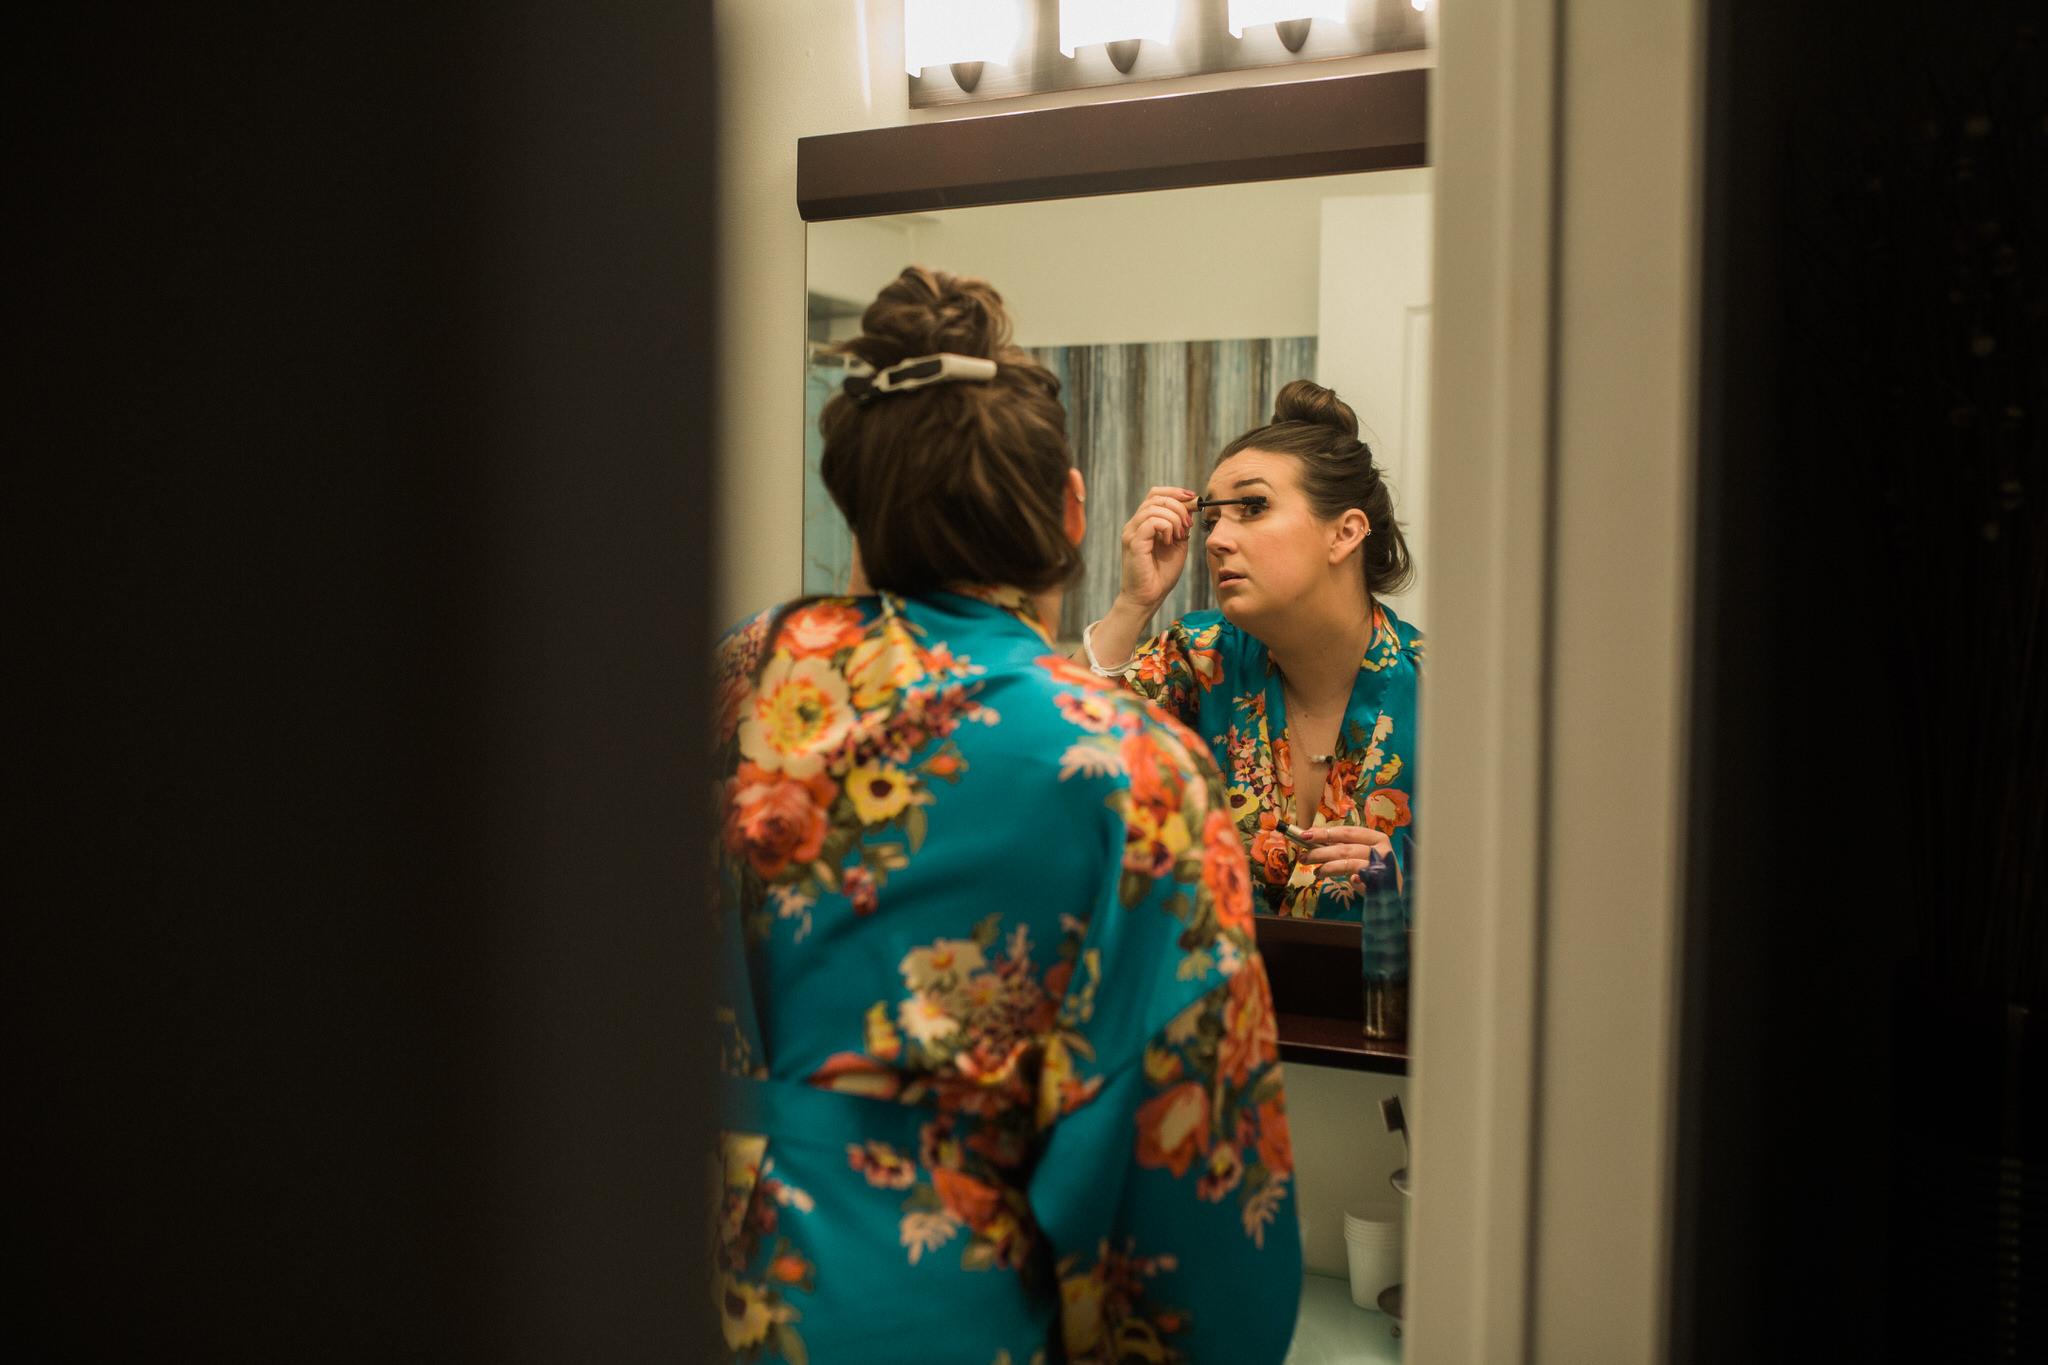 Whitby Wedding Photographer Carol Poitras - - Bridesmaid makeup